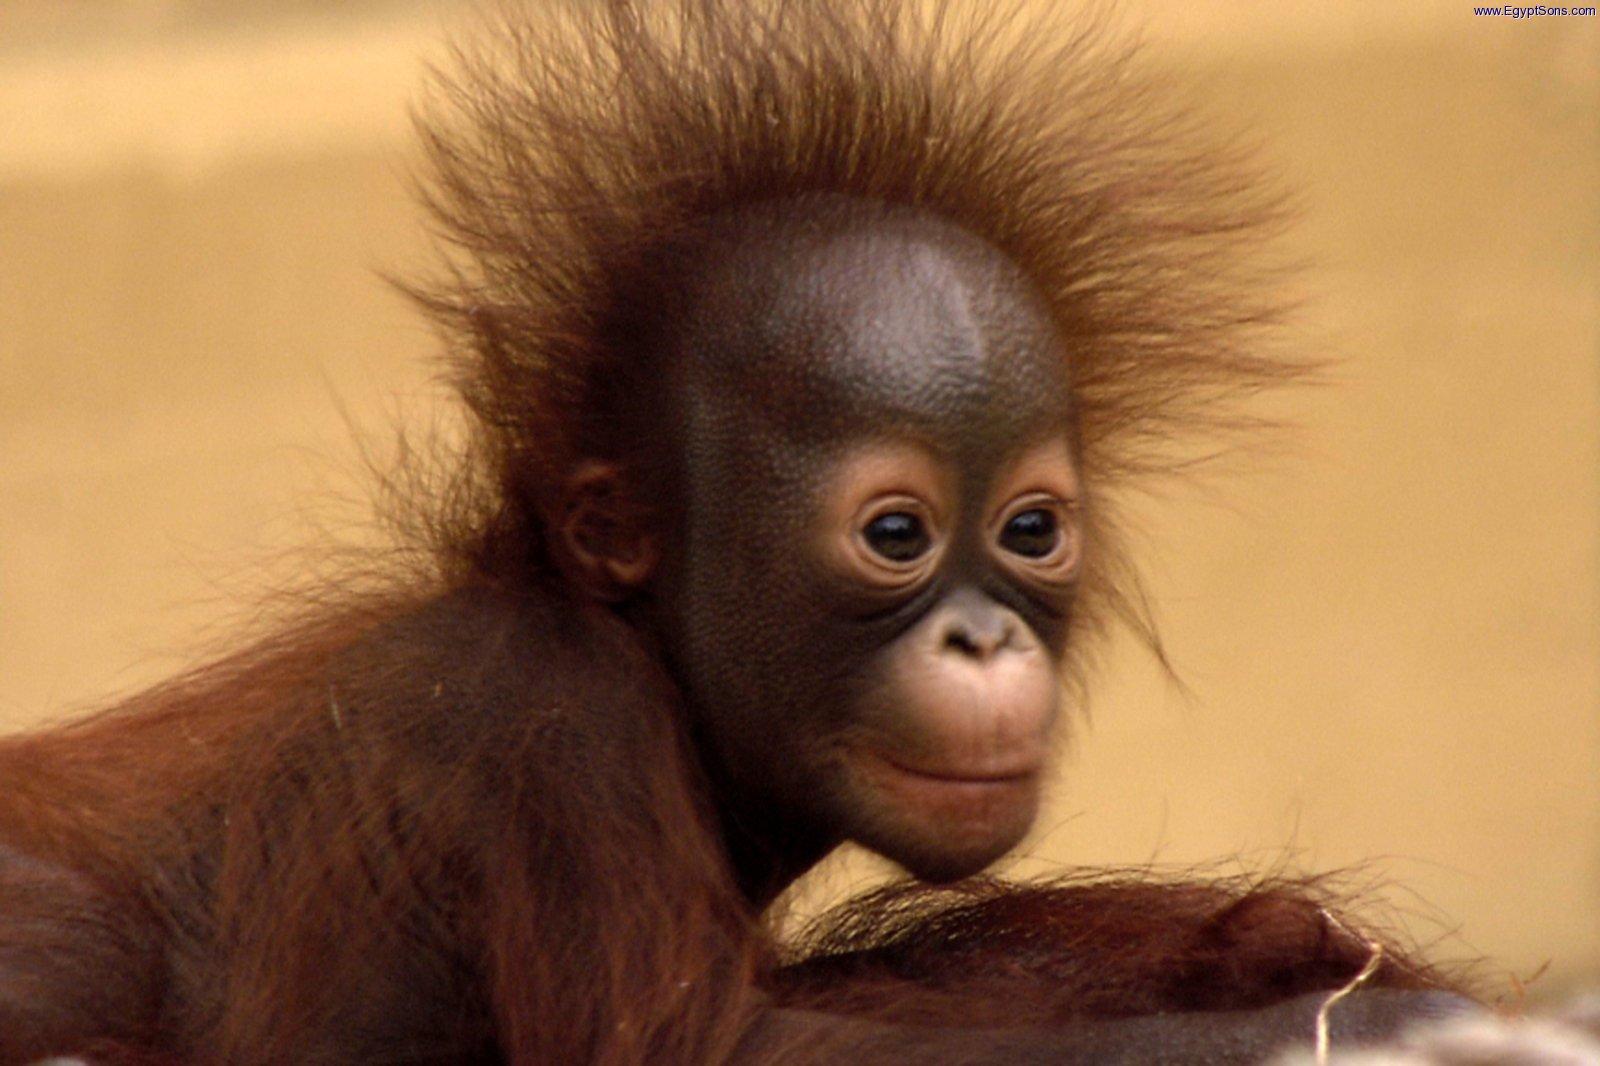 Baby_Planet_ep01_Orangutan.jpg